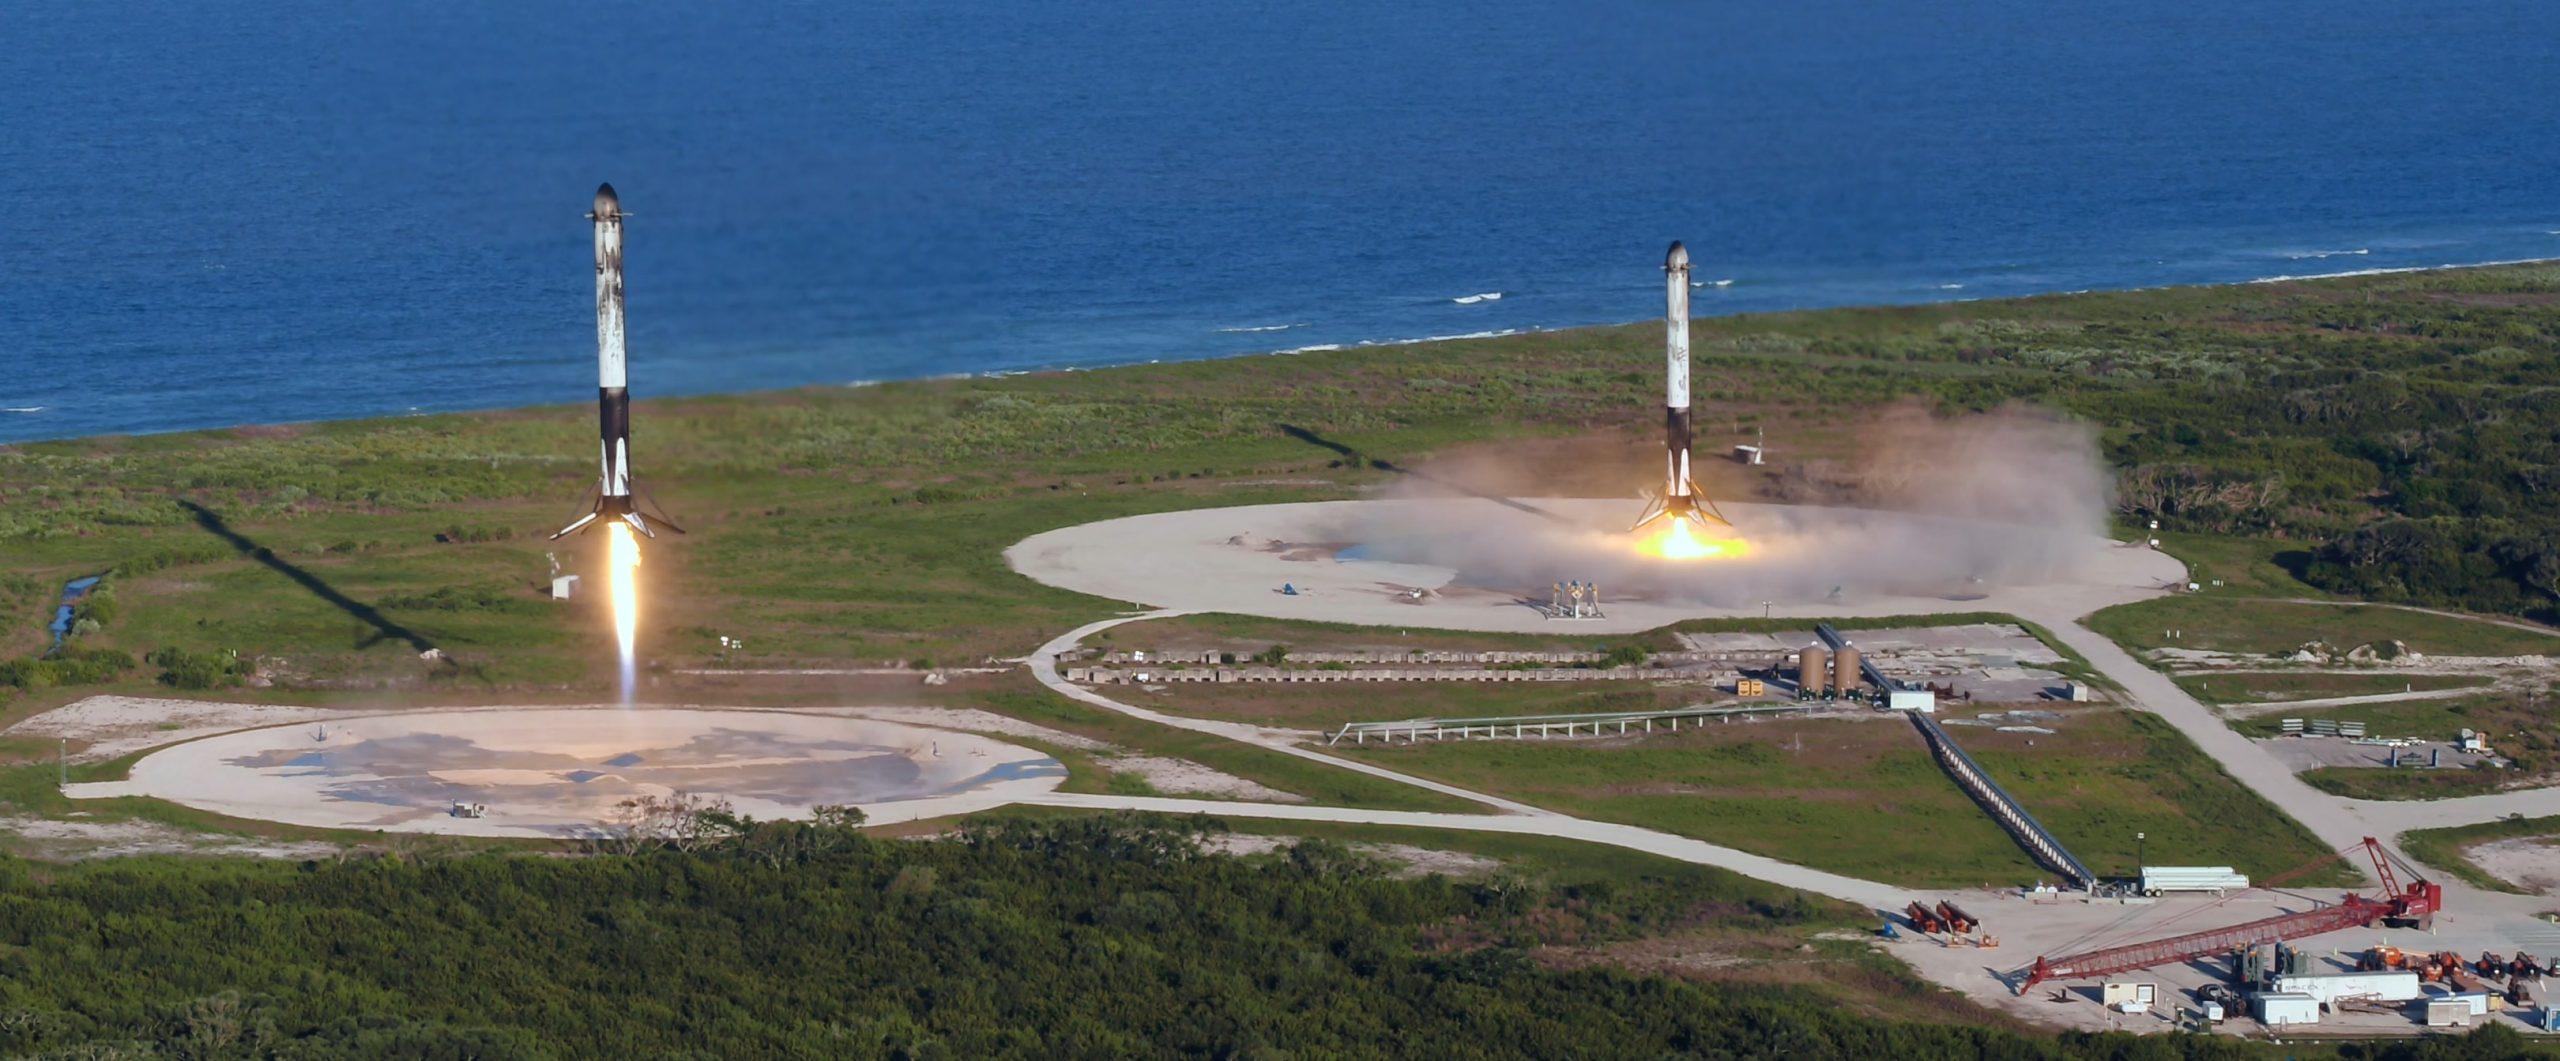 Falcon Heavy Arabsat 6A B1052 B1053 LZ-1 LZ-2 041120 (SpaceX) 1